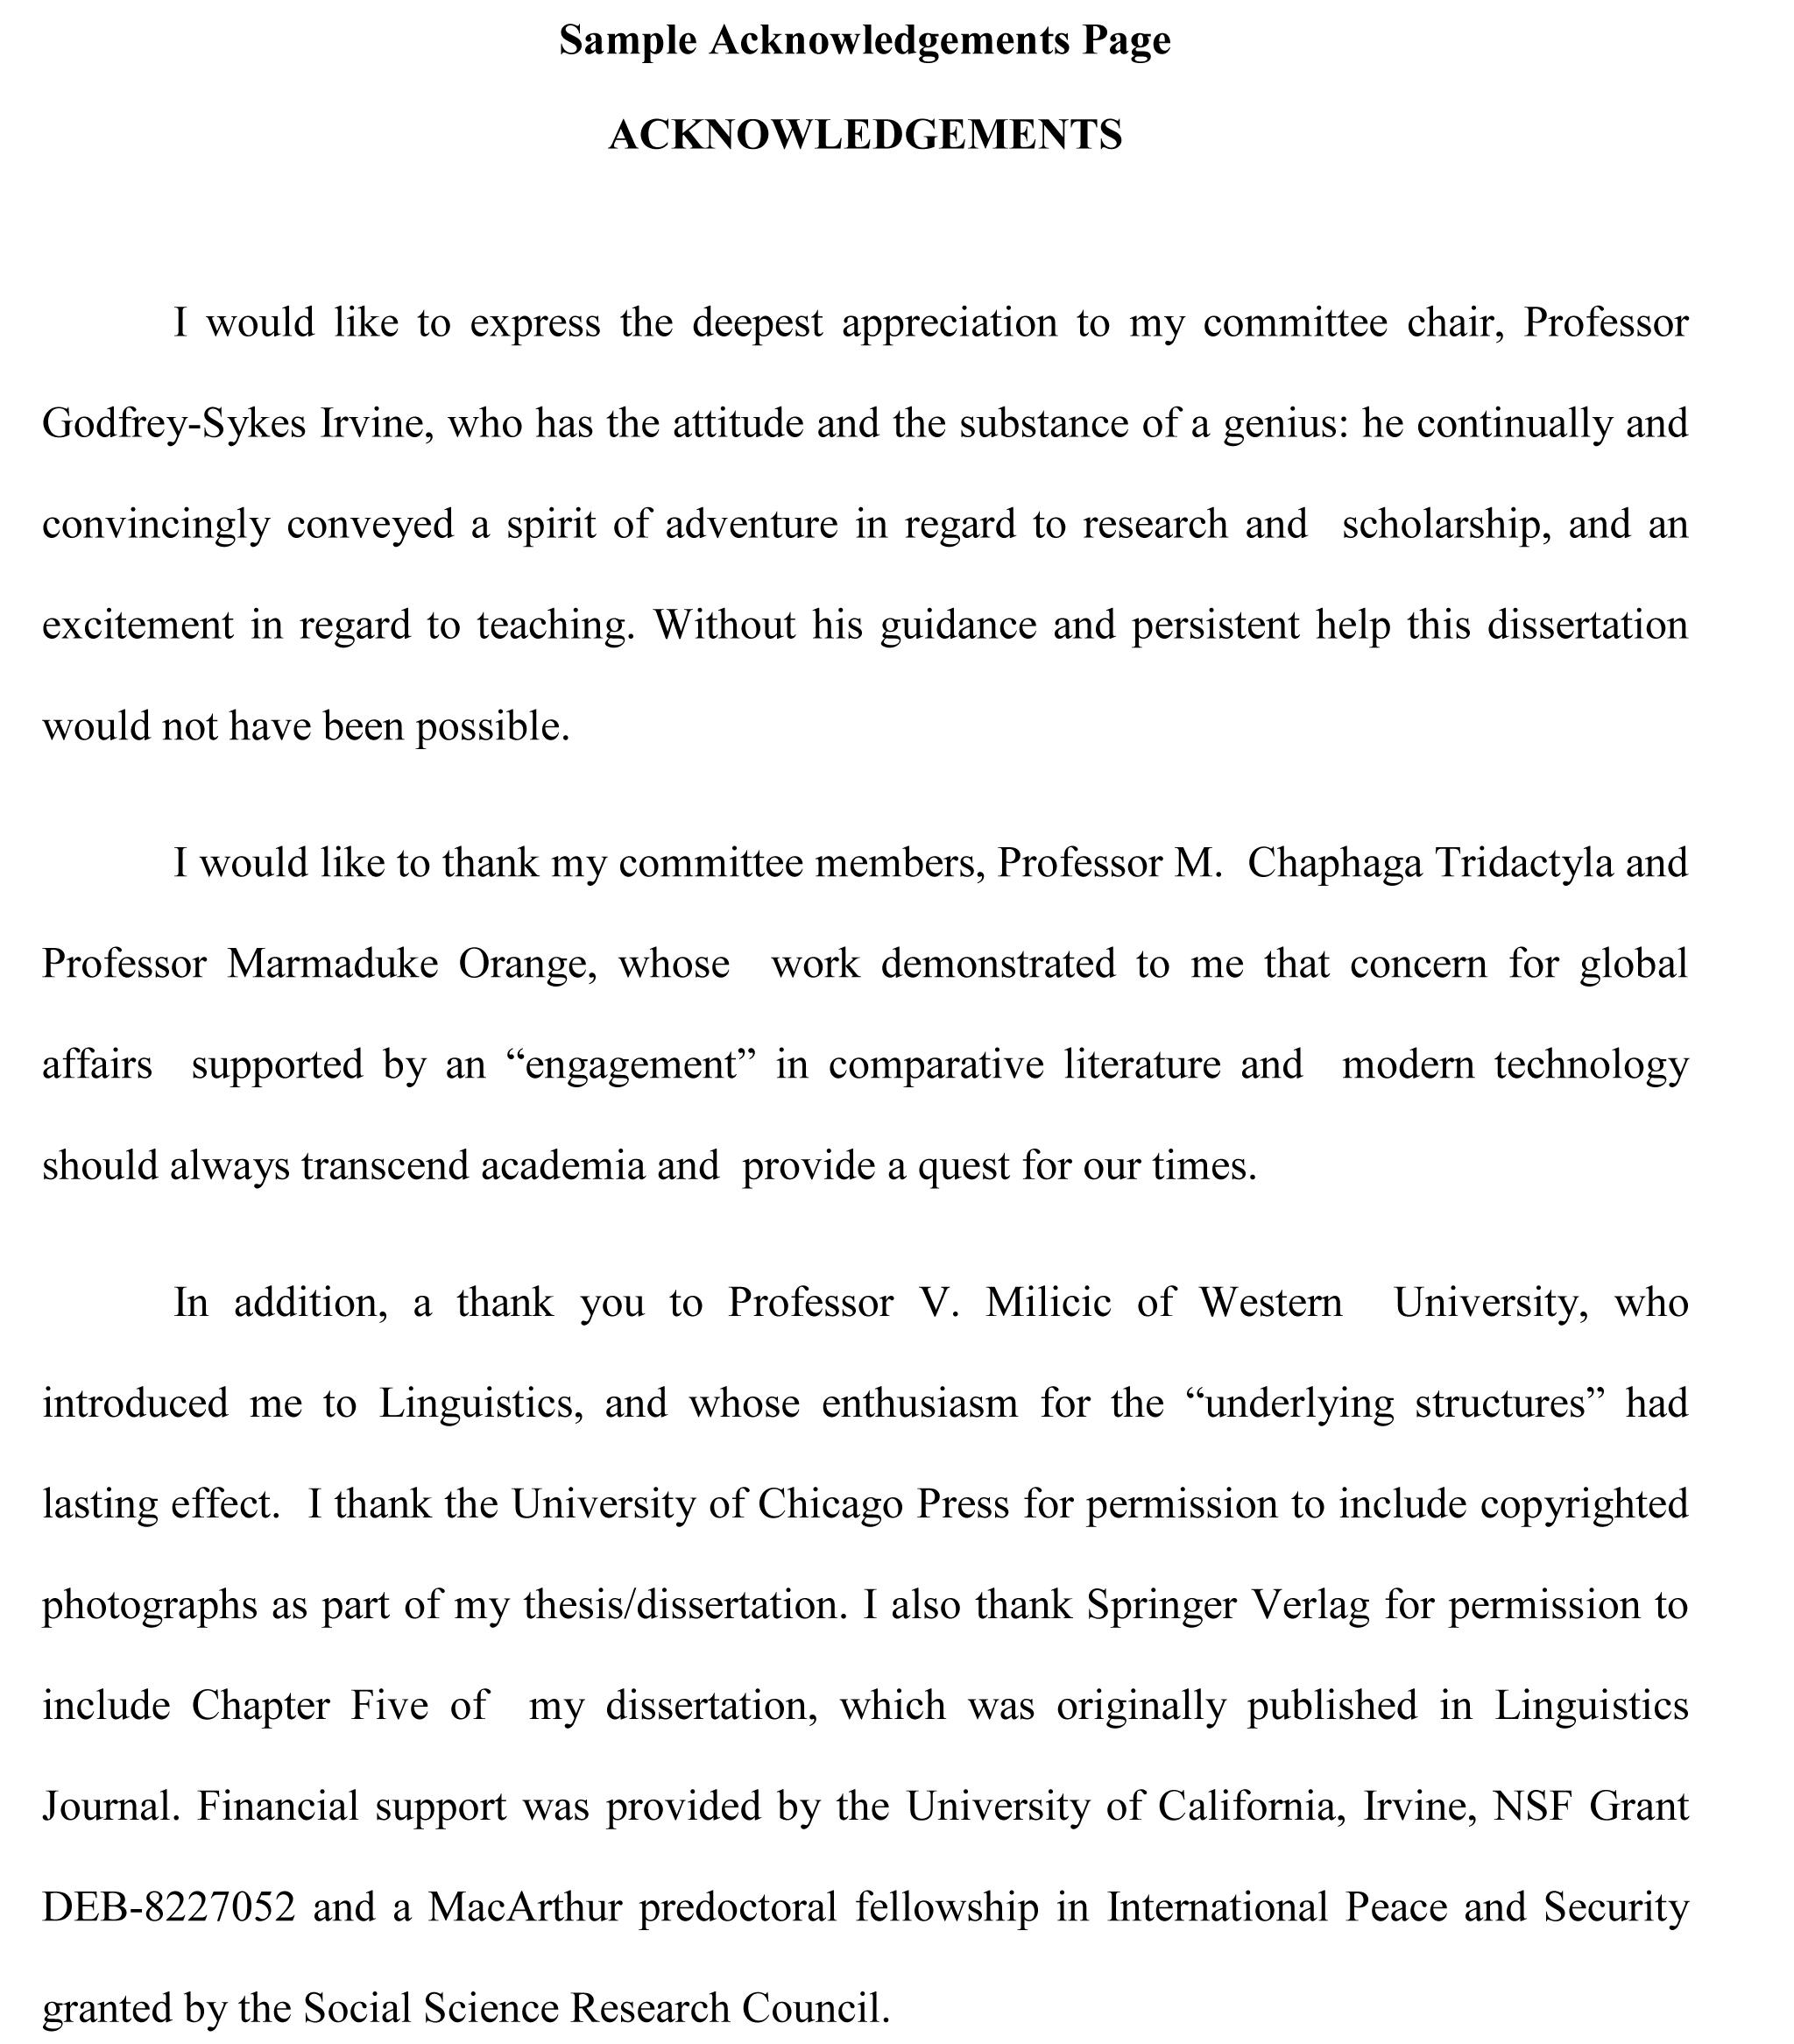 Dissertation acknowledegment